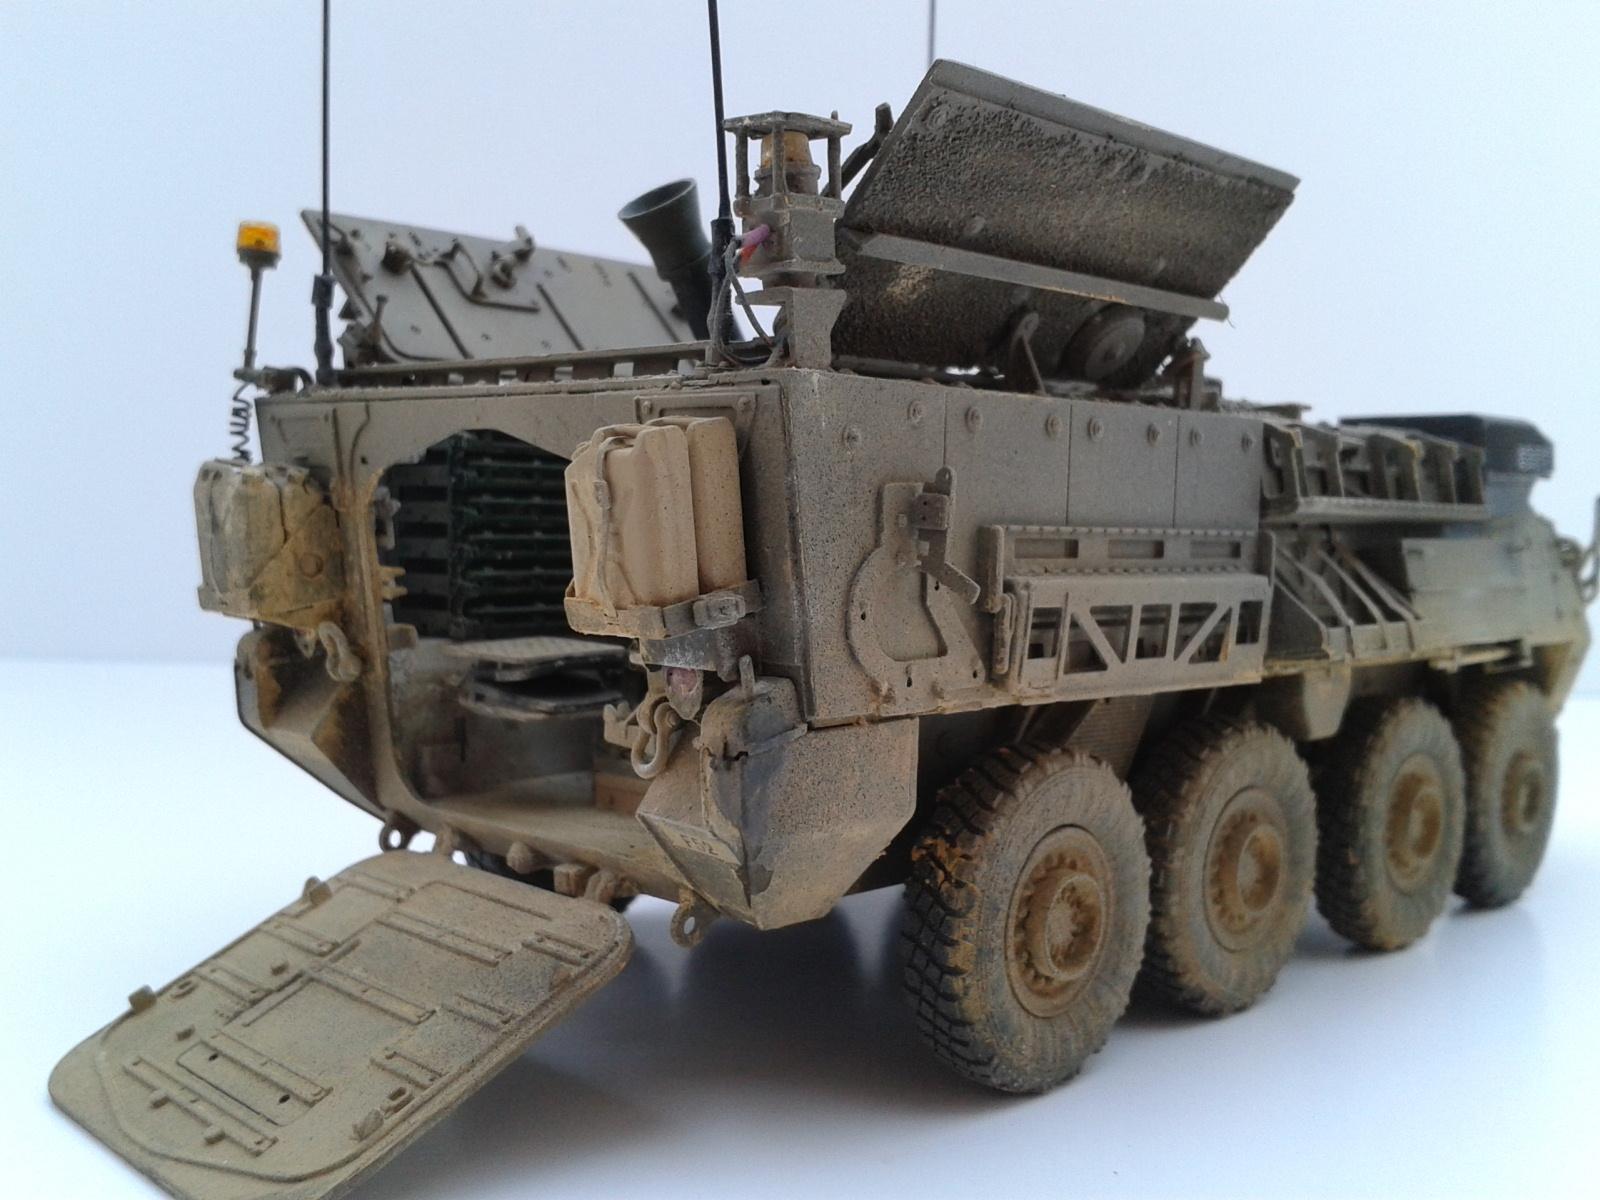 Stryker M1129 Mortar Carrier MC-B ...Montage terminé !!!! - Page 2 Ecqh